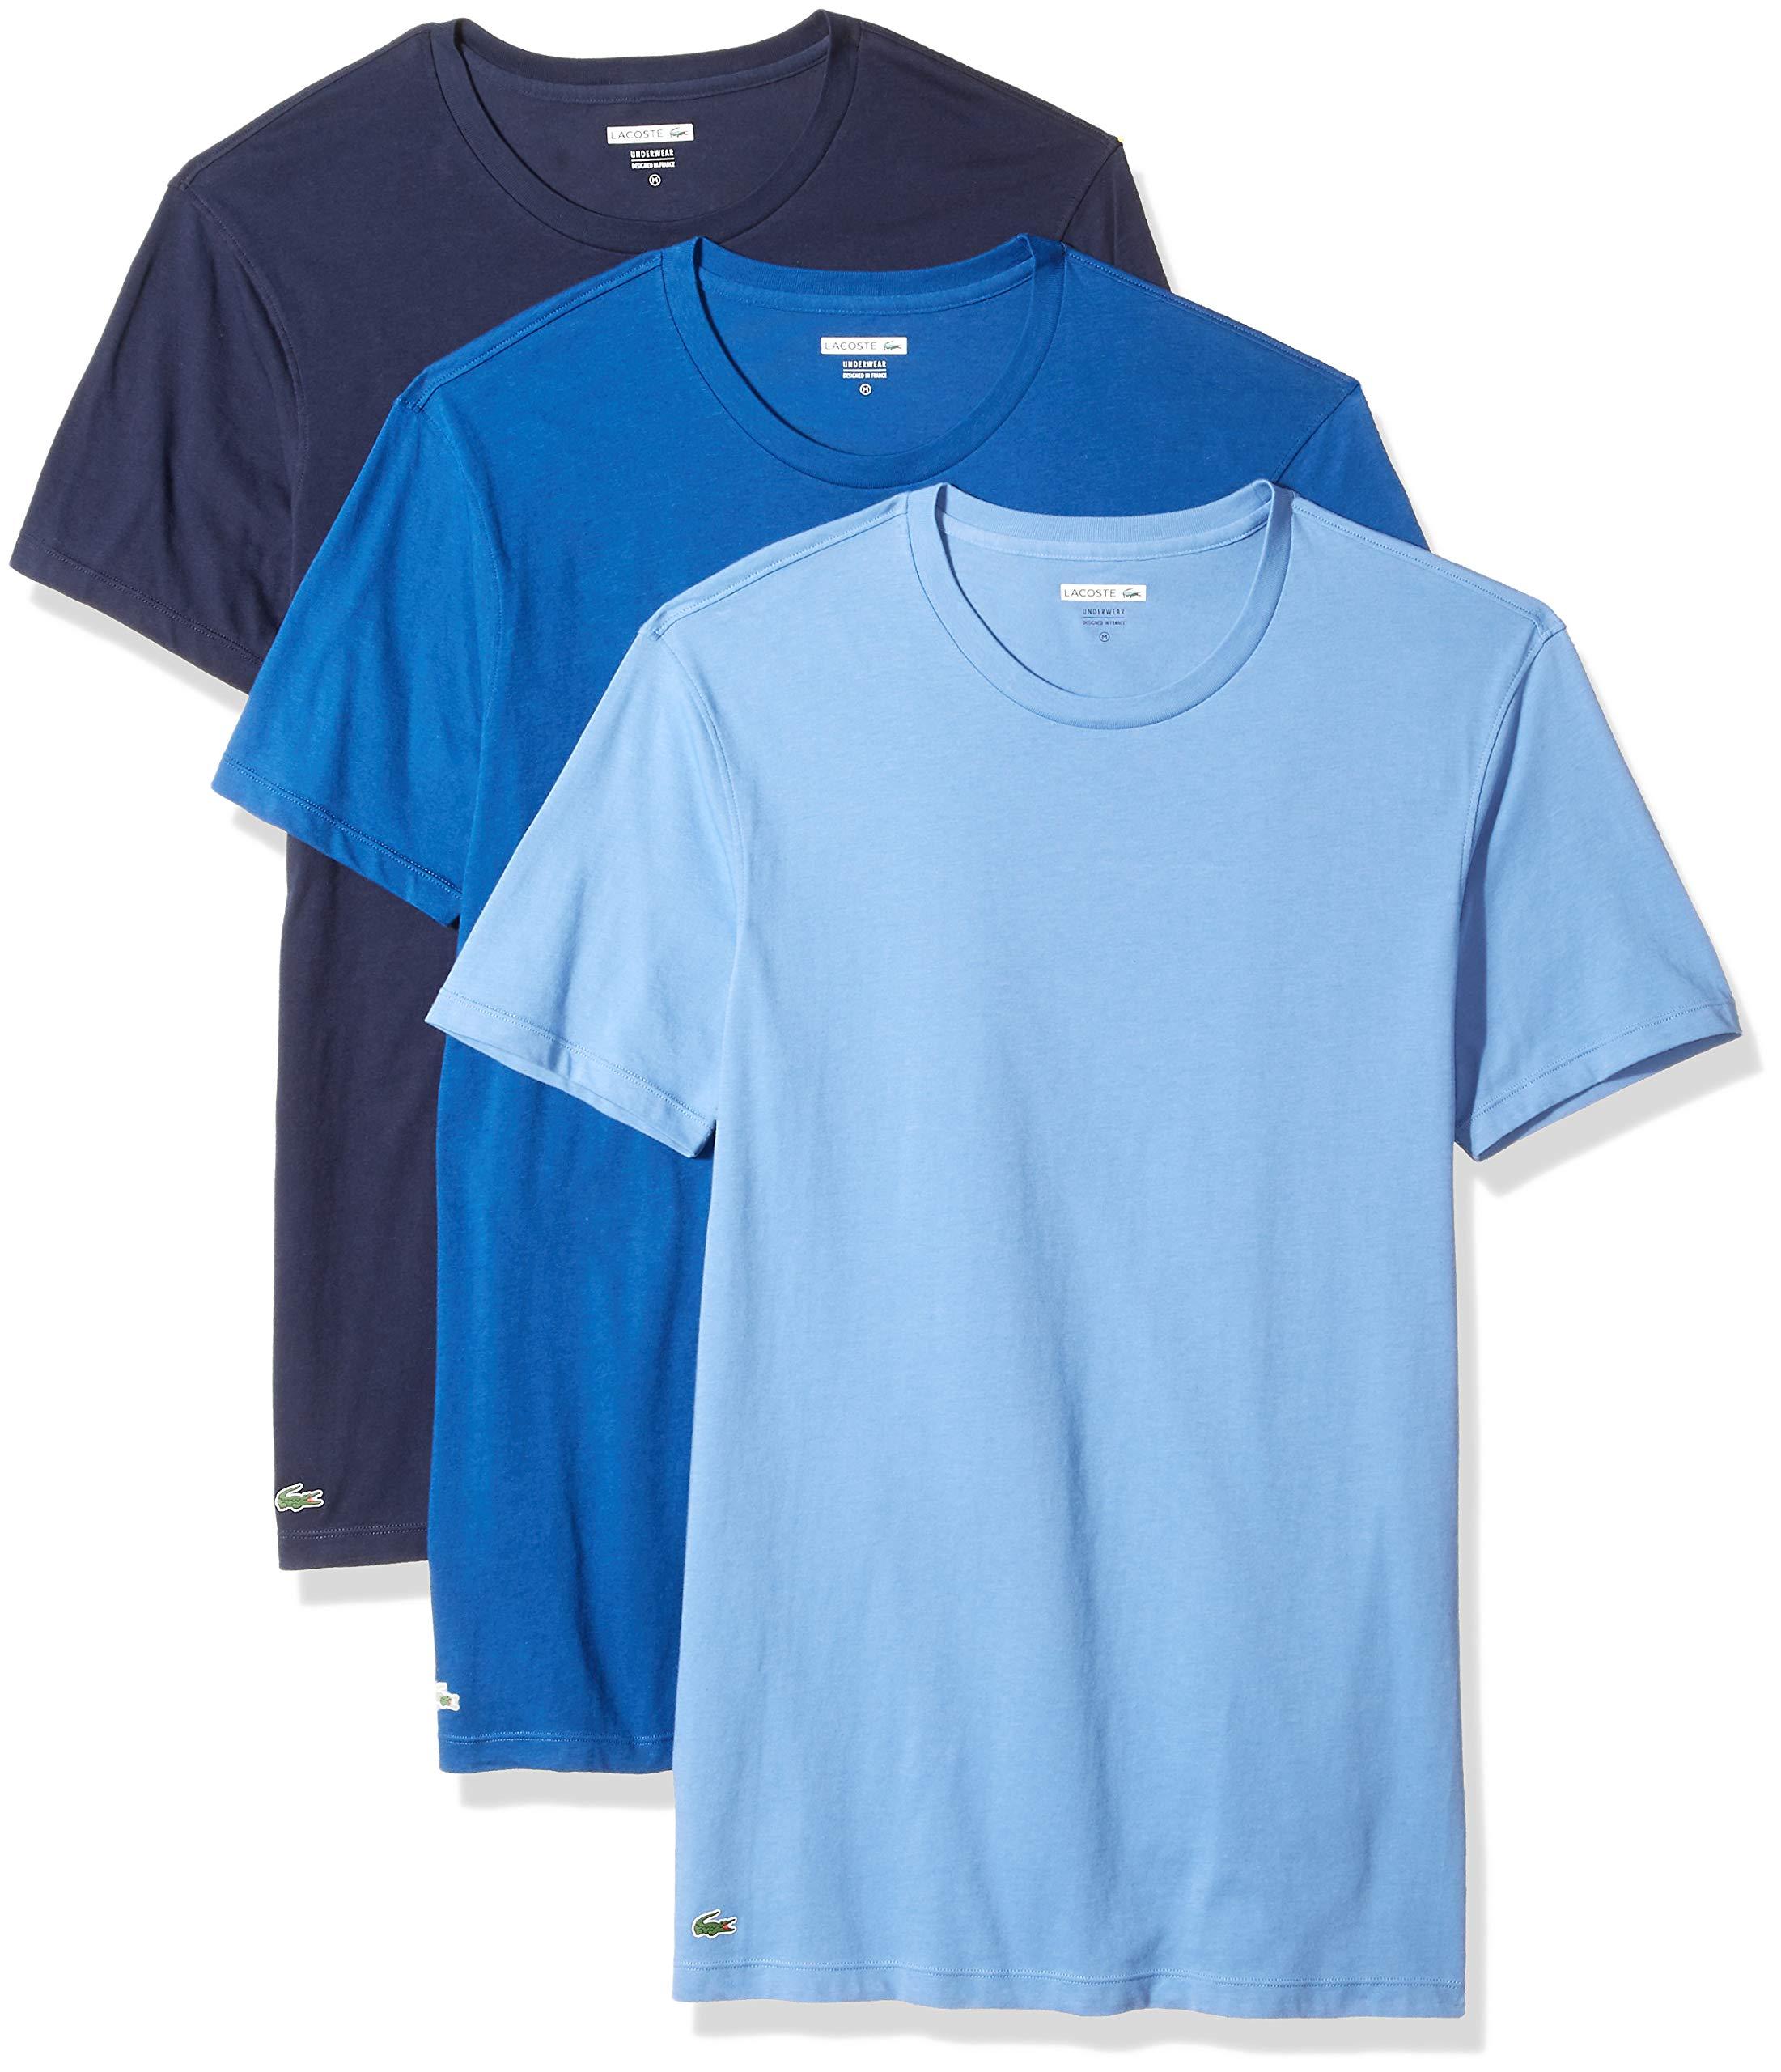 Lacoste Men's Essentials Cotton Crew-Neck T-Shirt (Pack of 3), Navy/Blue Yonder/Limoges, L